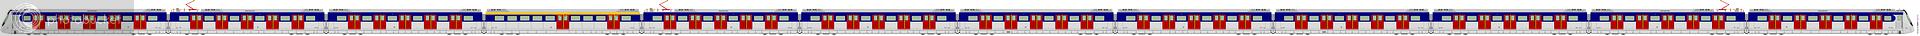 Train 1948